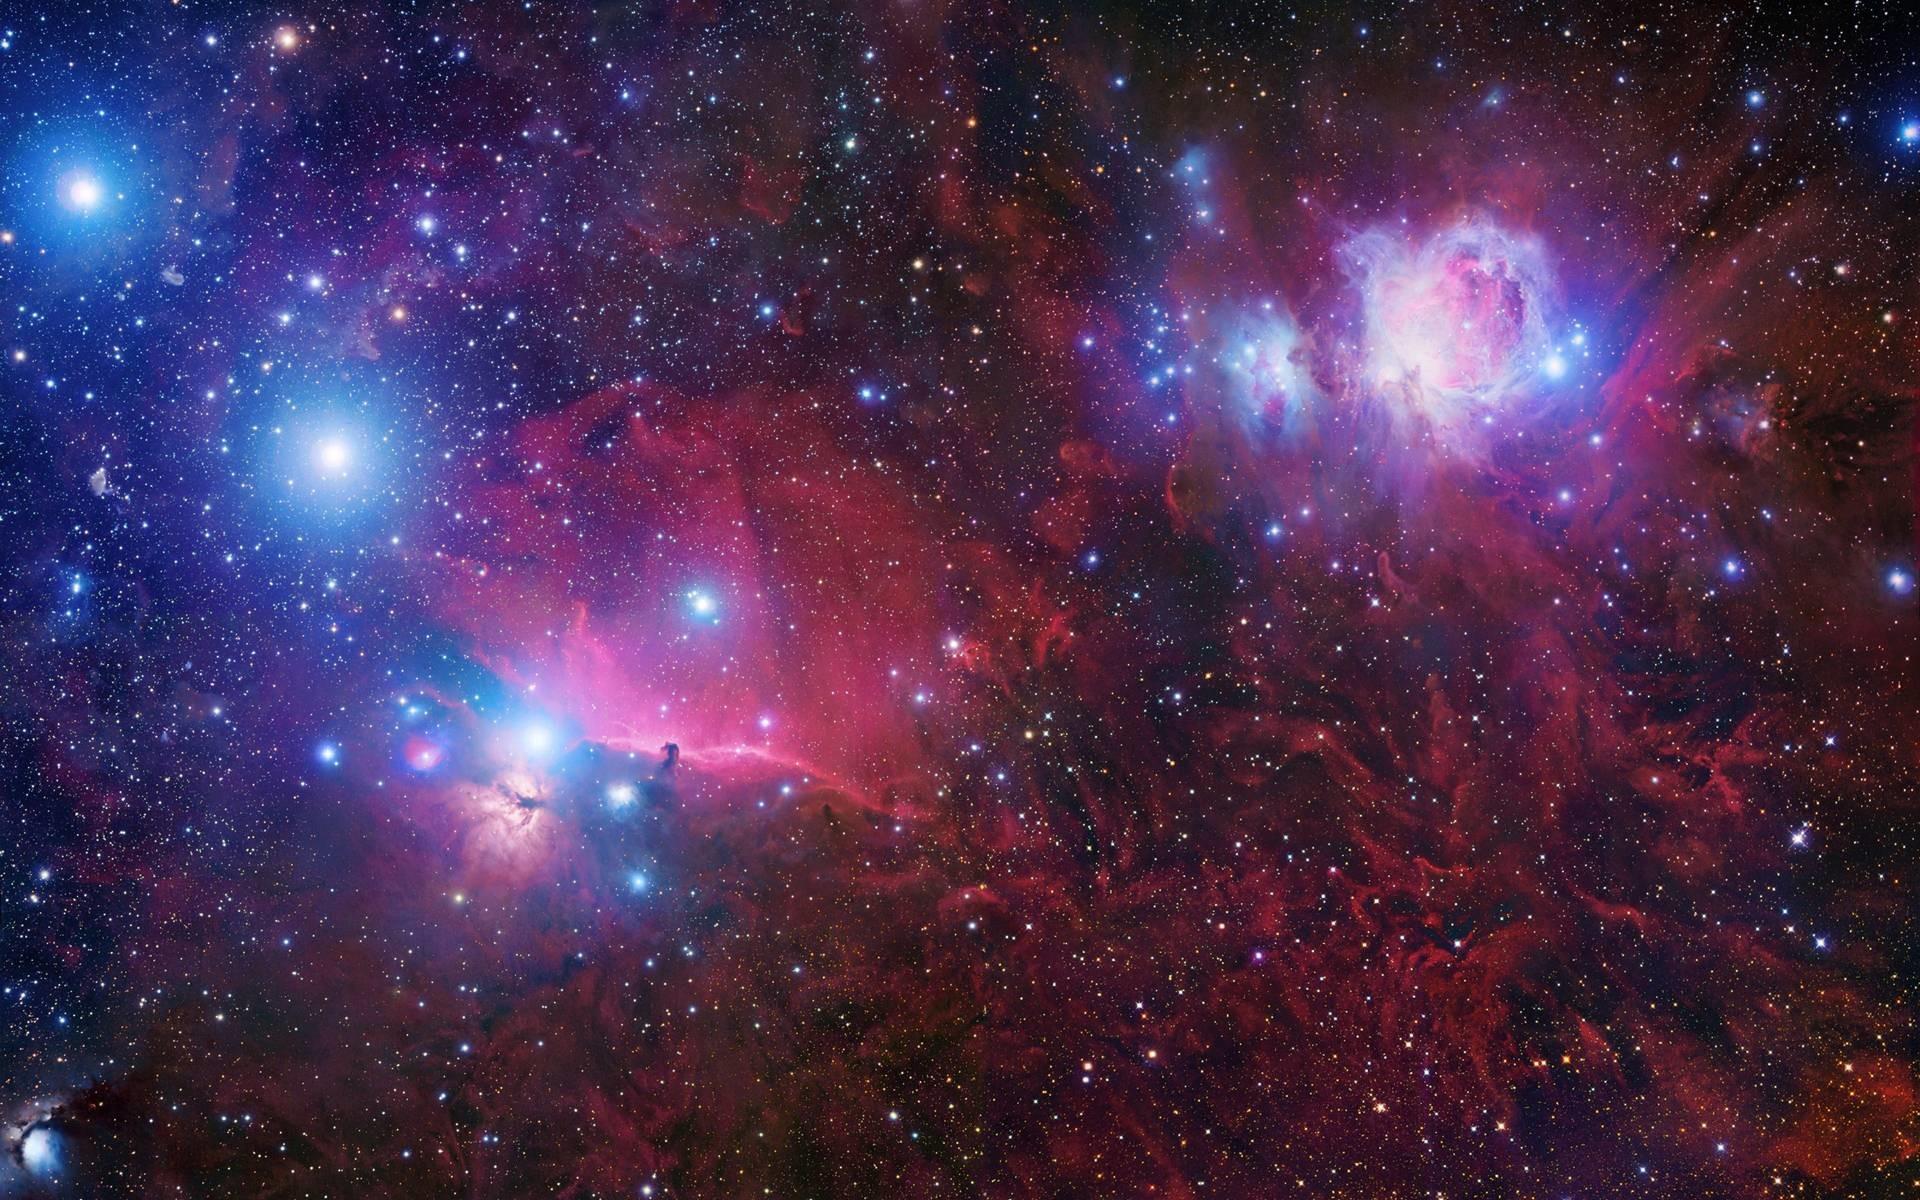 Galaxy Astronomy Epic 1080p Space Trippy Www Galleryneed Com